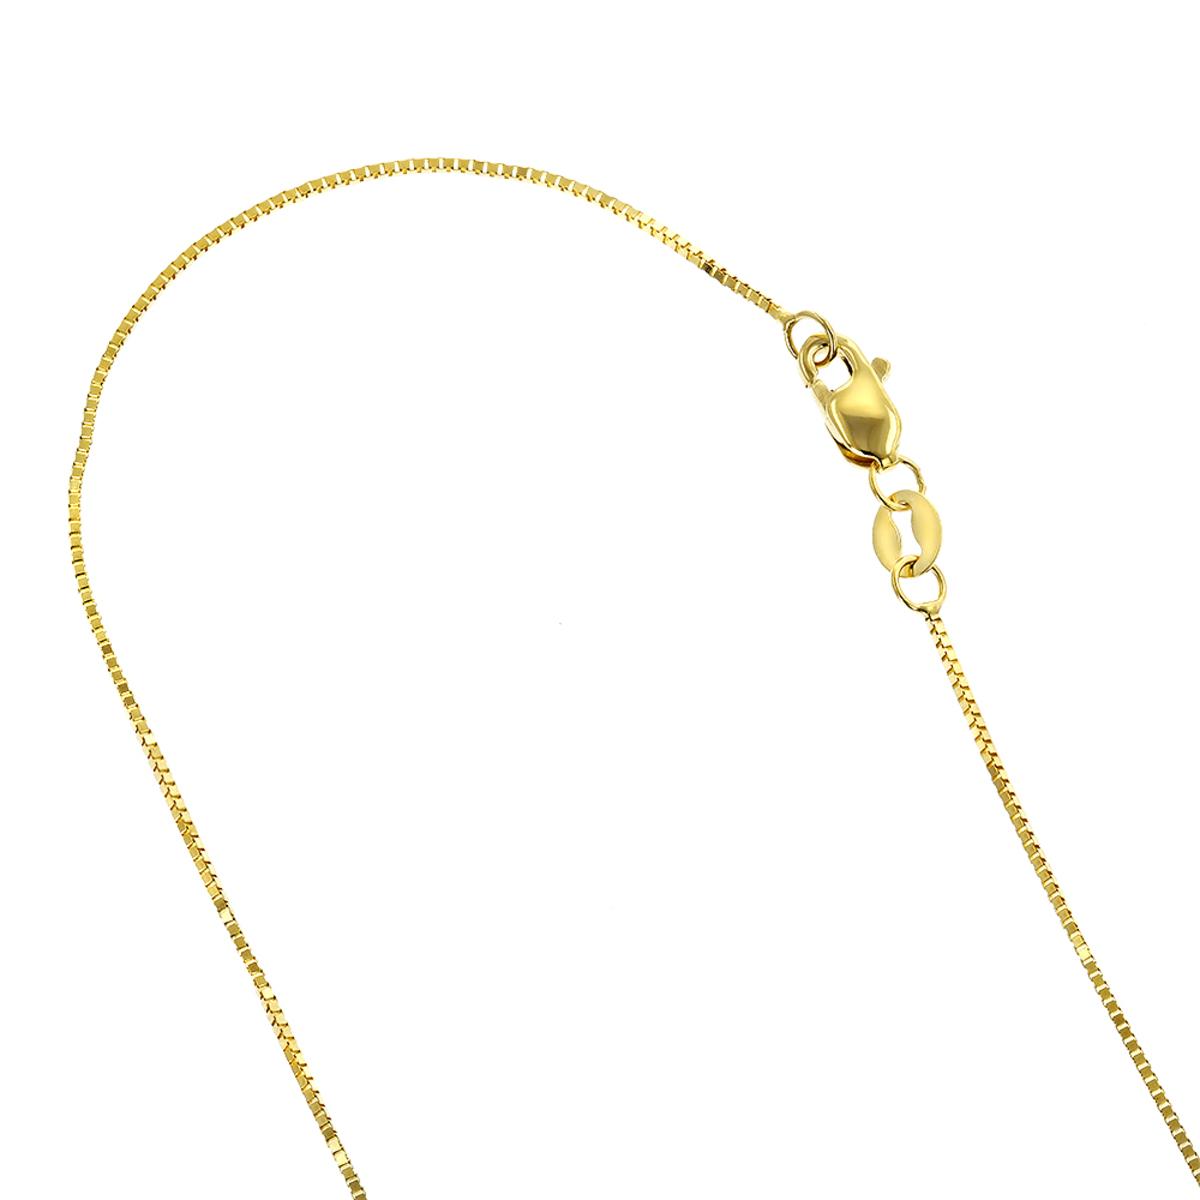 LUXURMAN Solid 14k Gold Box Chain For Women 0.7mm Wide